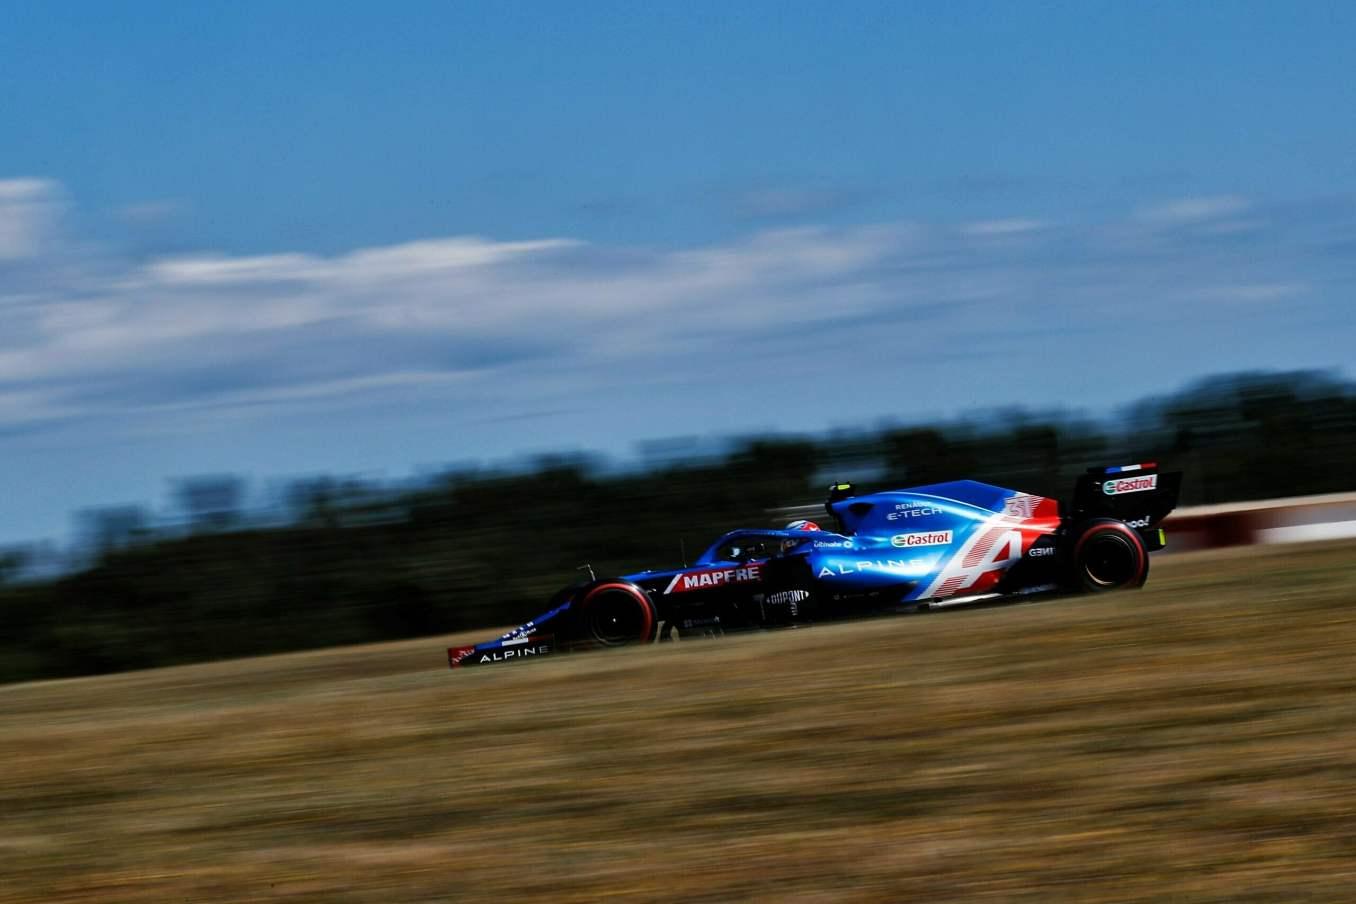 Alpine F1 Team GRAND PRIX HEINEKEN DU PORTUGAL Alonso Ocon 2021 A521 1 scaled   Alpine F1 Team : des essais convaincants au Grand Prix Heineken du Portugal